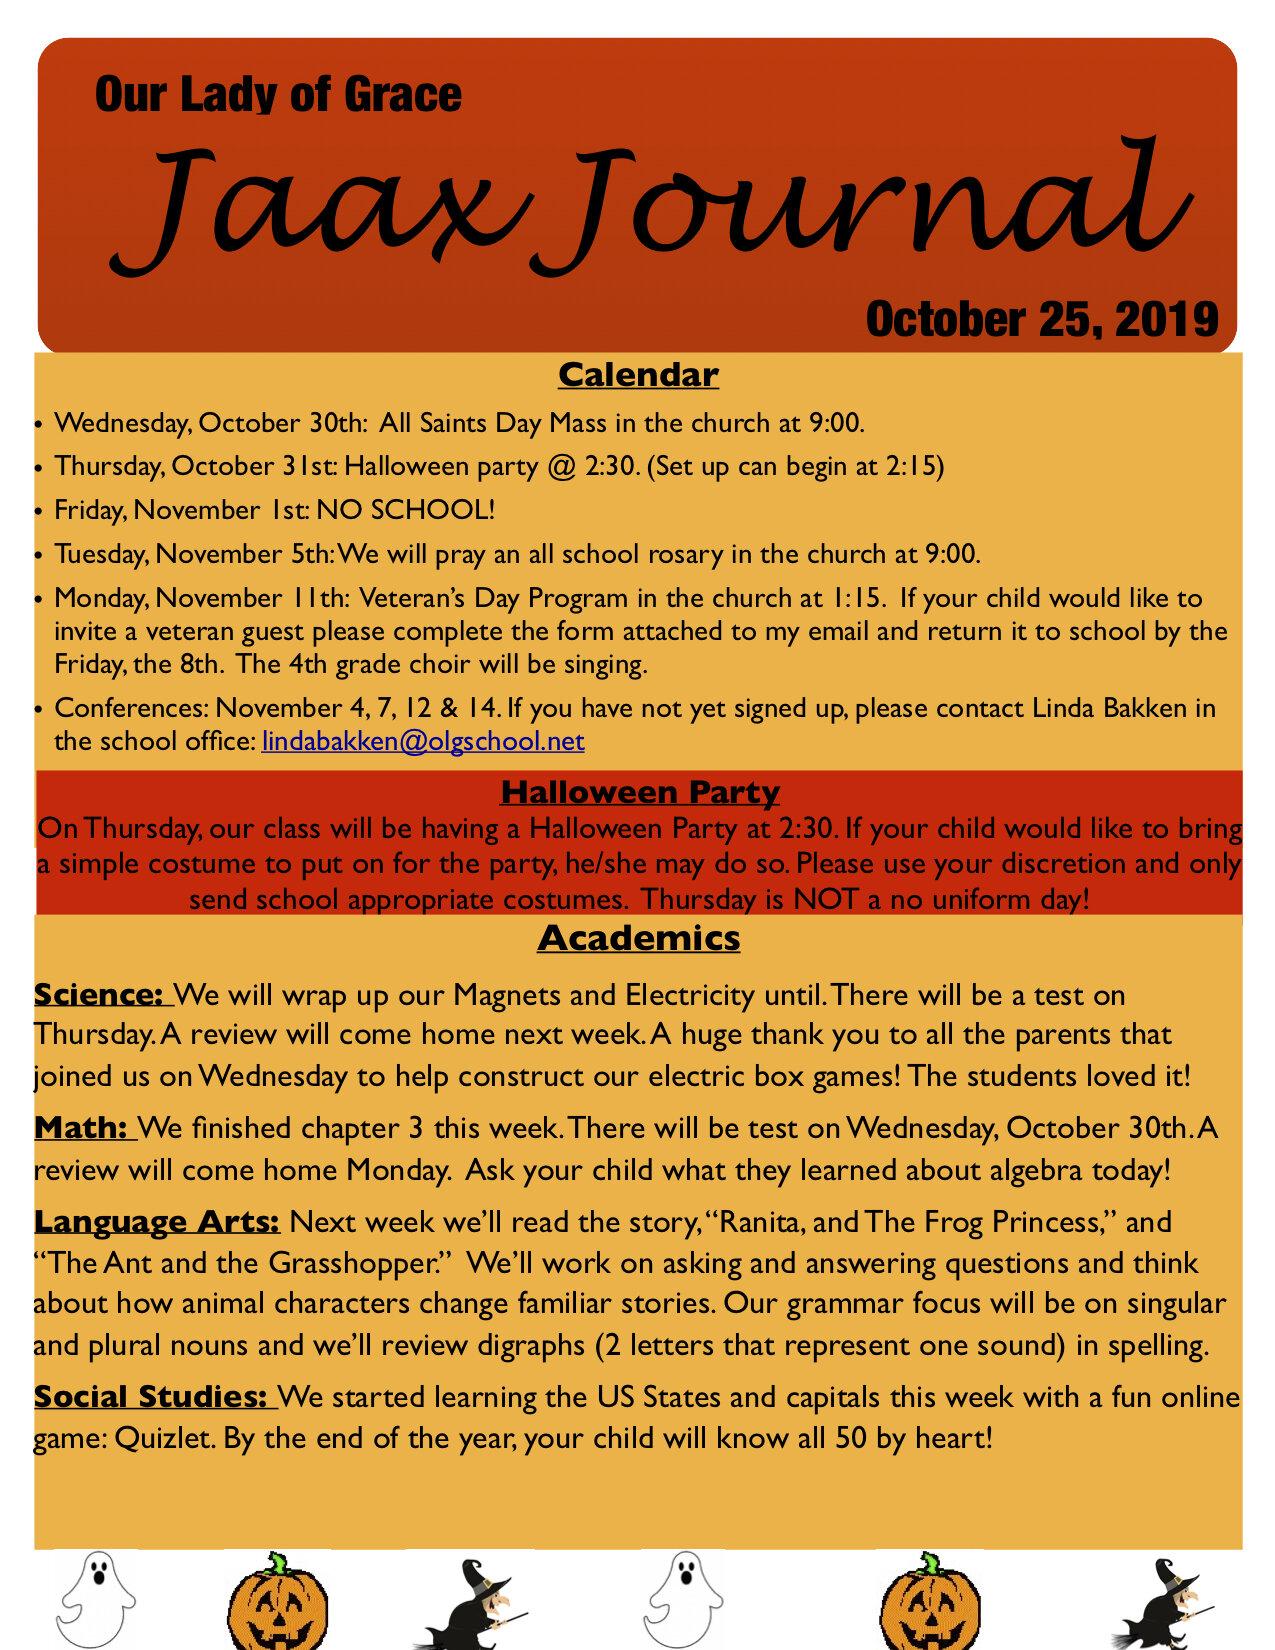 JaaxJournal10-25-19.jpg